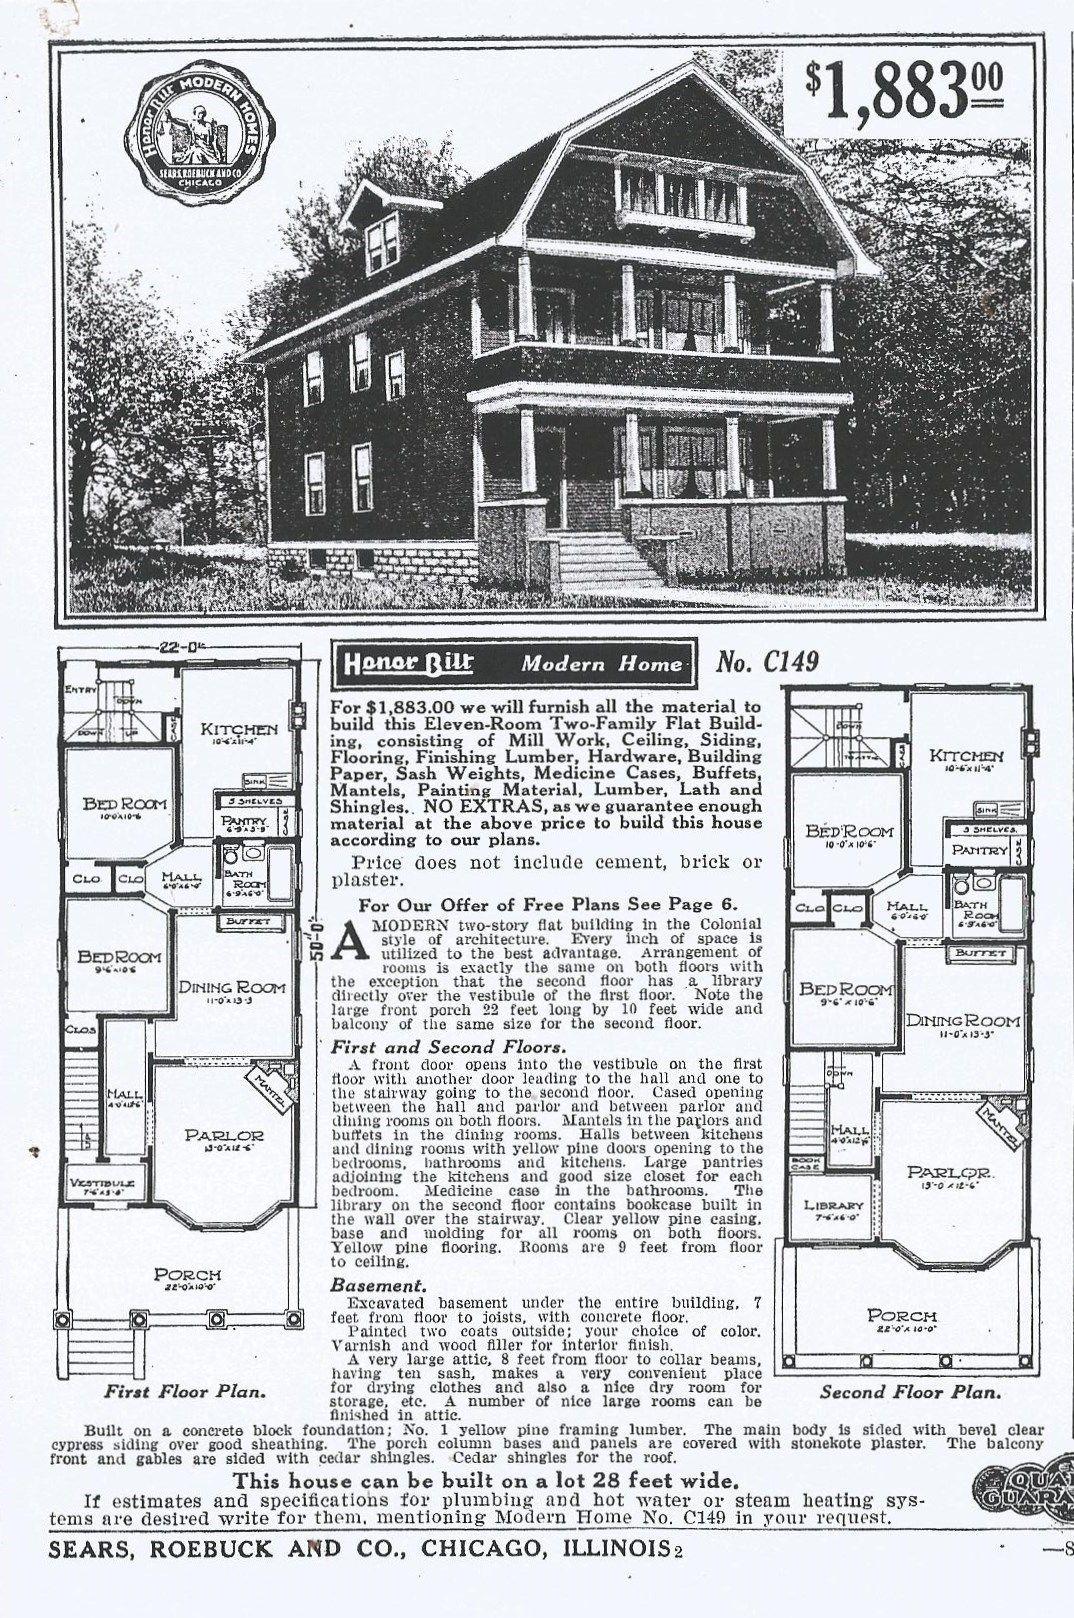 Sears Oakdale 1909 1911 149 1912 149 1913 149 1914 1915 1916 149 1917 C149 1918 Architectural Floor Plans Multi Family Homes Vintage House Plans